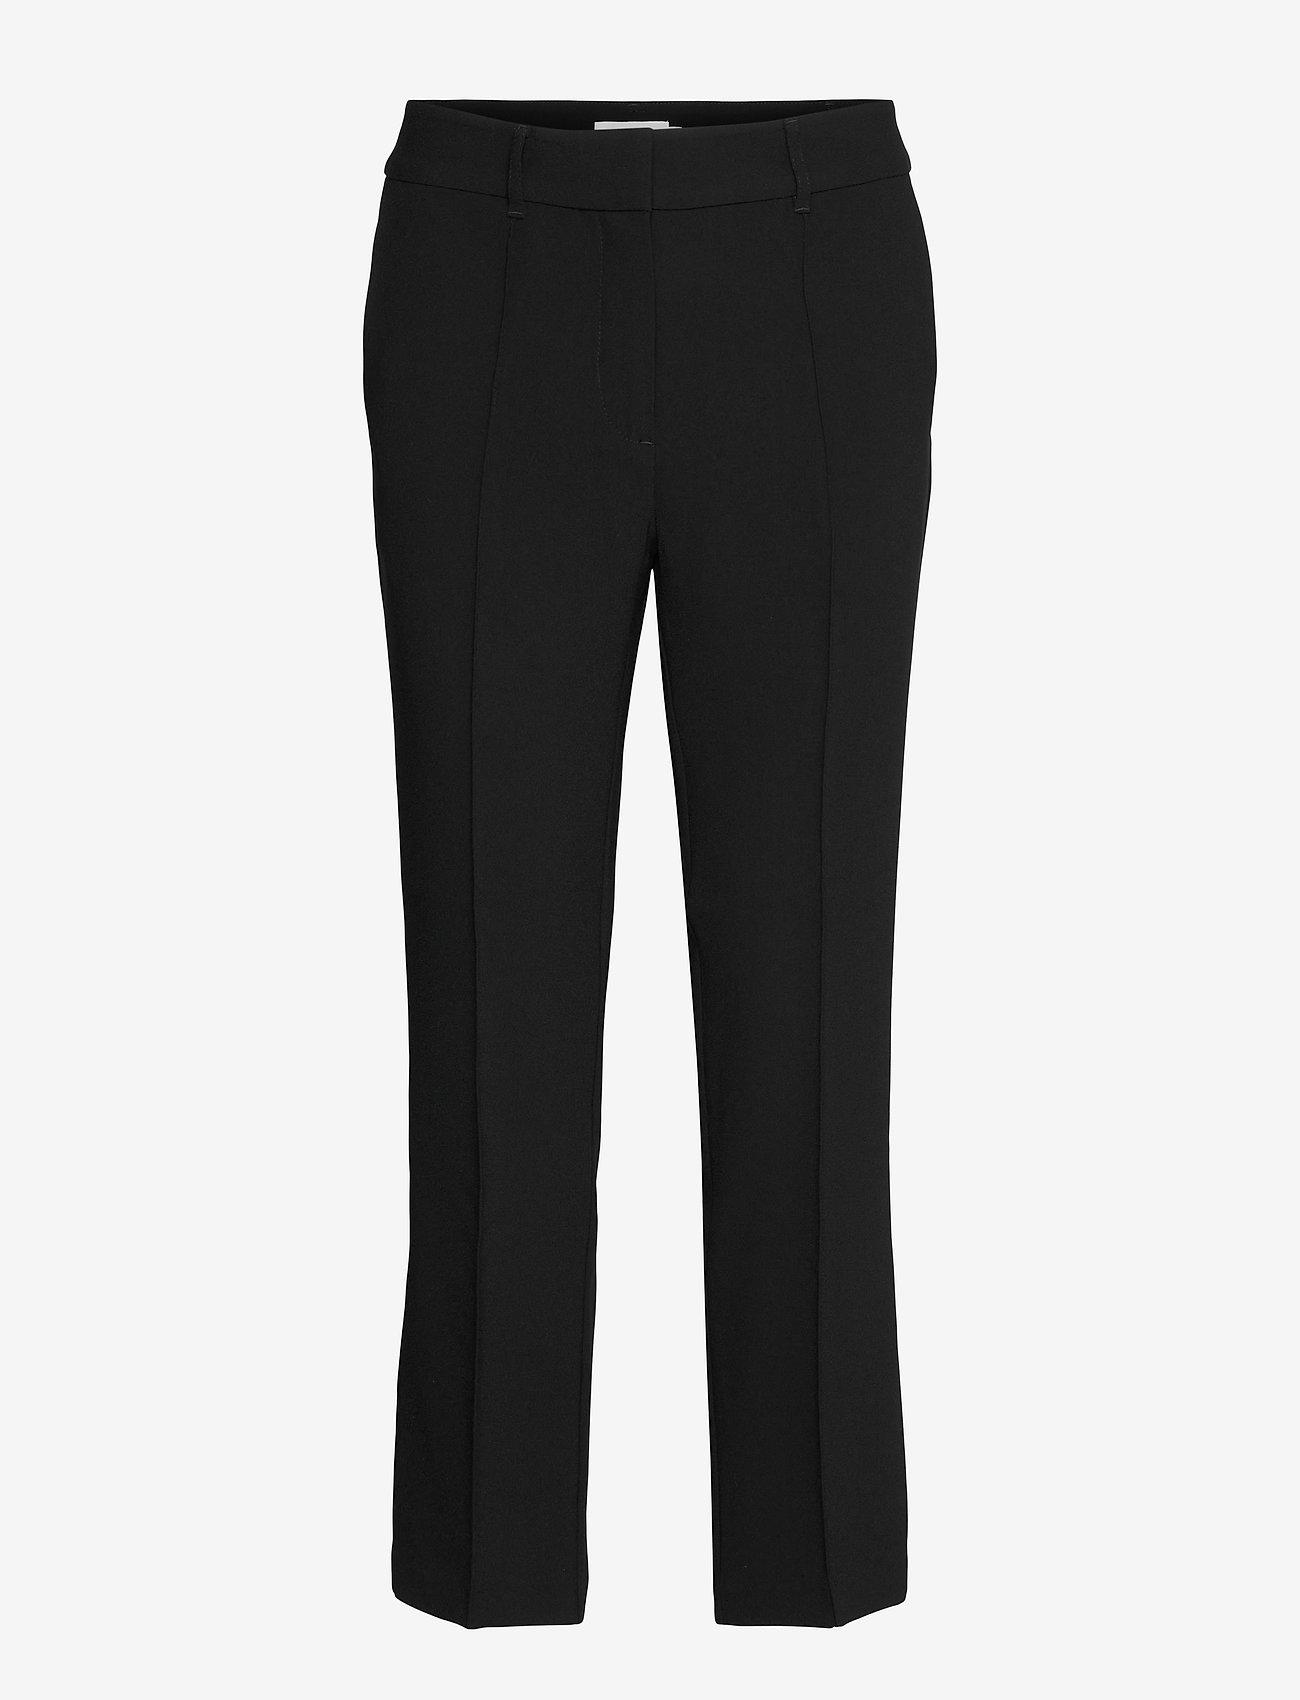 Stylein - BEN TROUSERS - slim fit bukser - black - 1